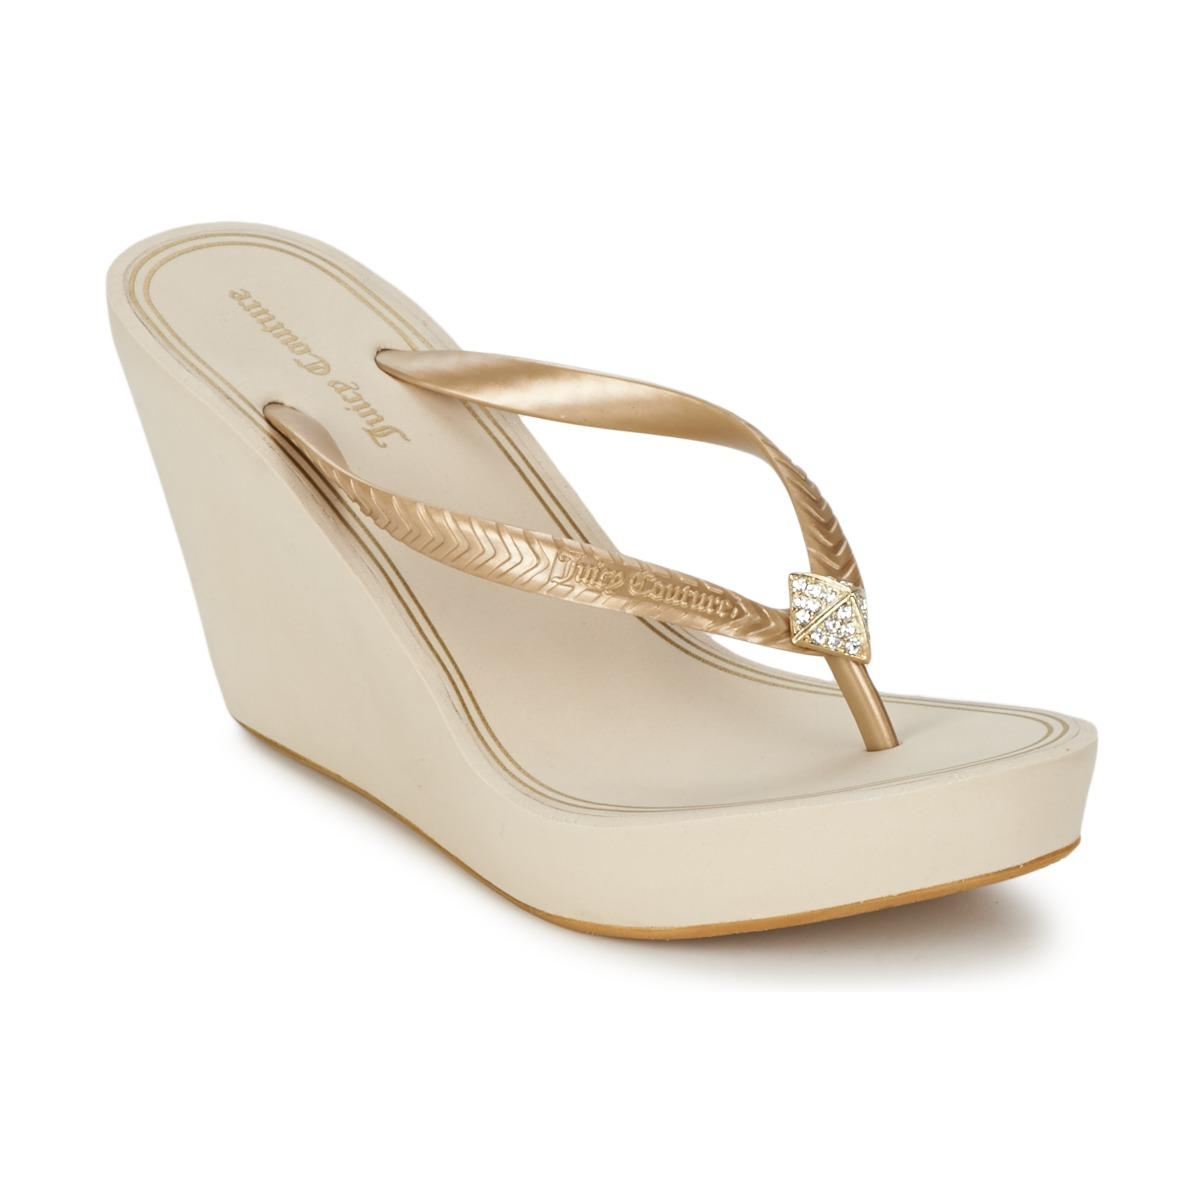 5a64b80ed693 Juicy Couture - White Brit Flip Flops   Sandals (shoes) - Lyst. View  fullscreen